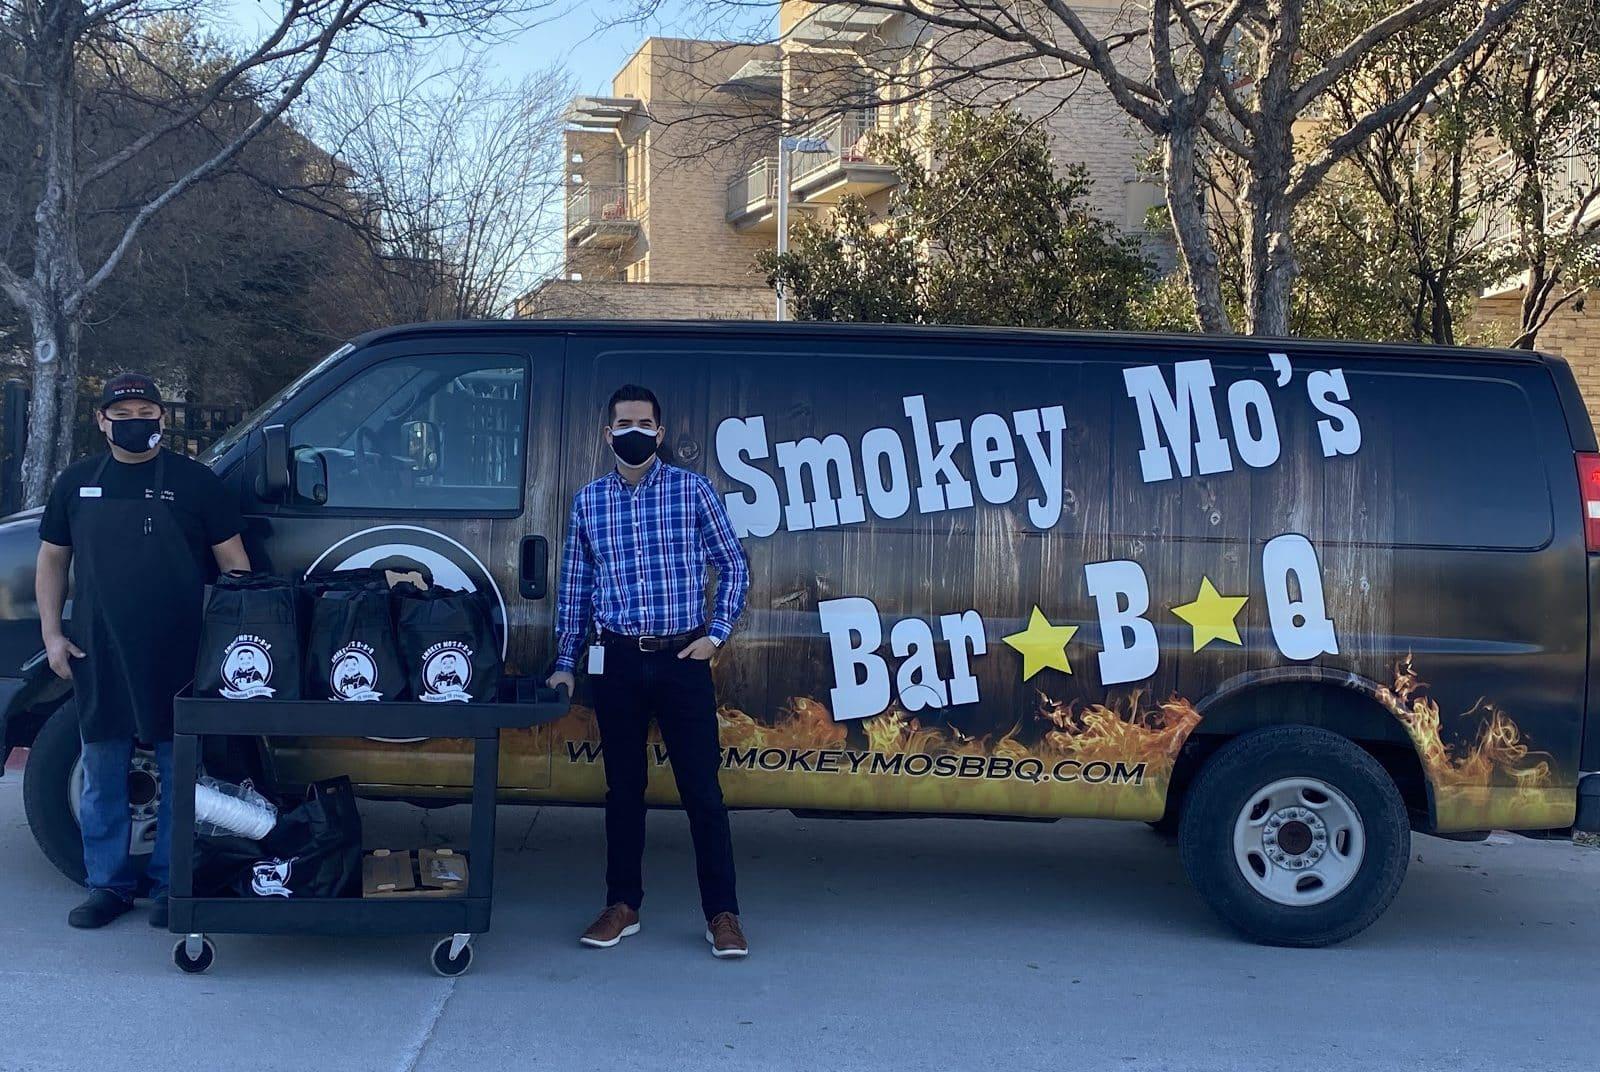 Smokey Mo's van delivering BBQ to Ronald McDonald House, Austin.